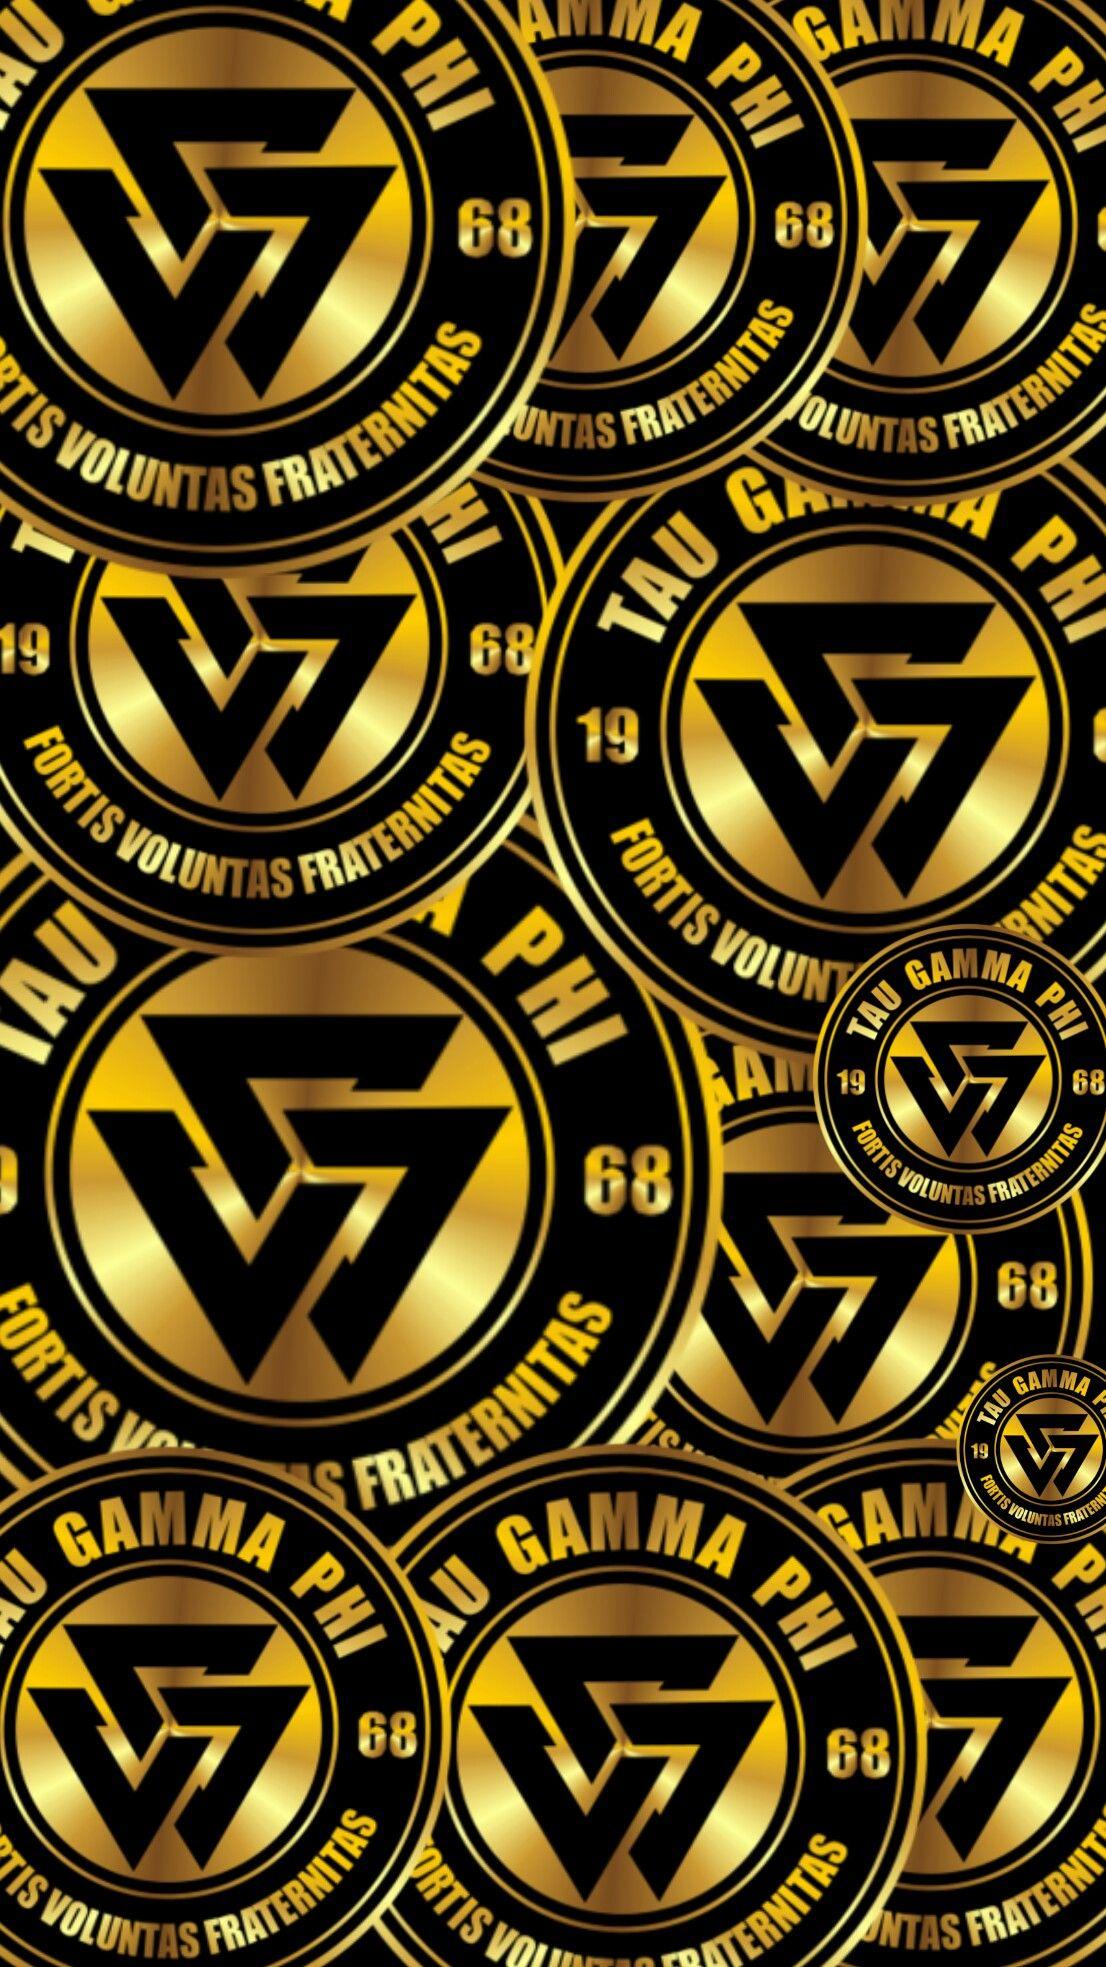 Triskelion Tau Gamma Wallpaper Gold 50 Android Iphone Tau Gamma Gamma Phi Ha Wallpaper